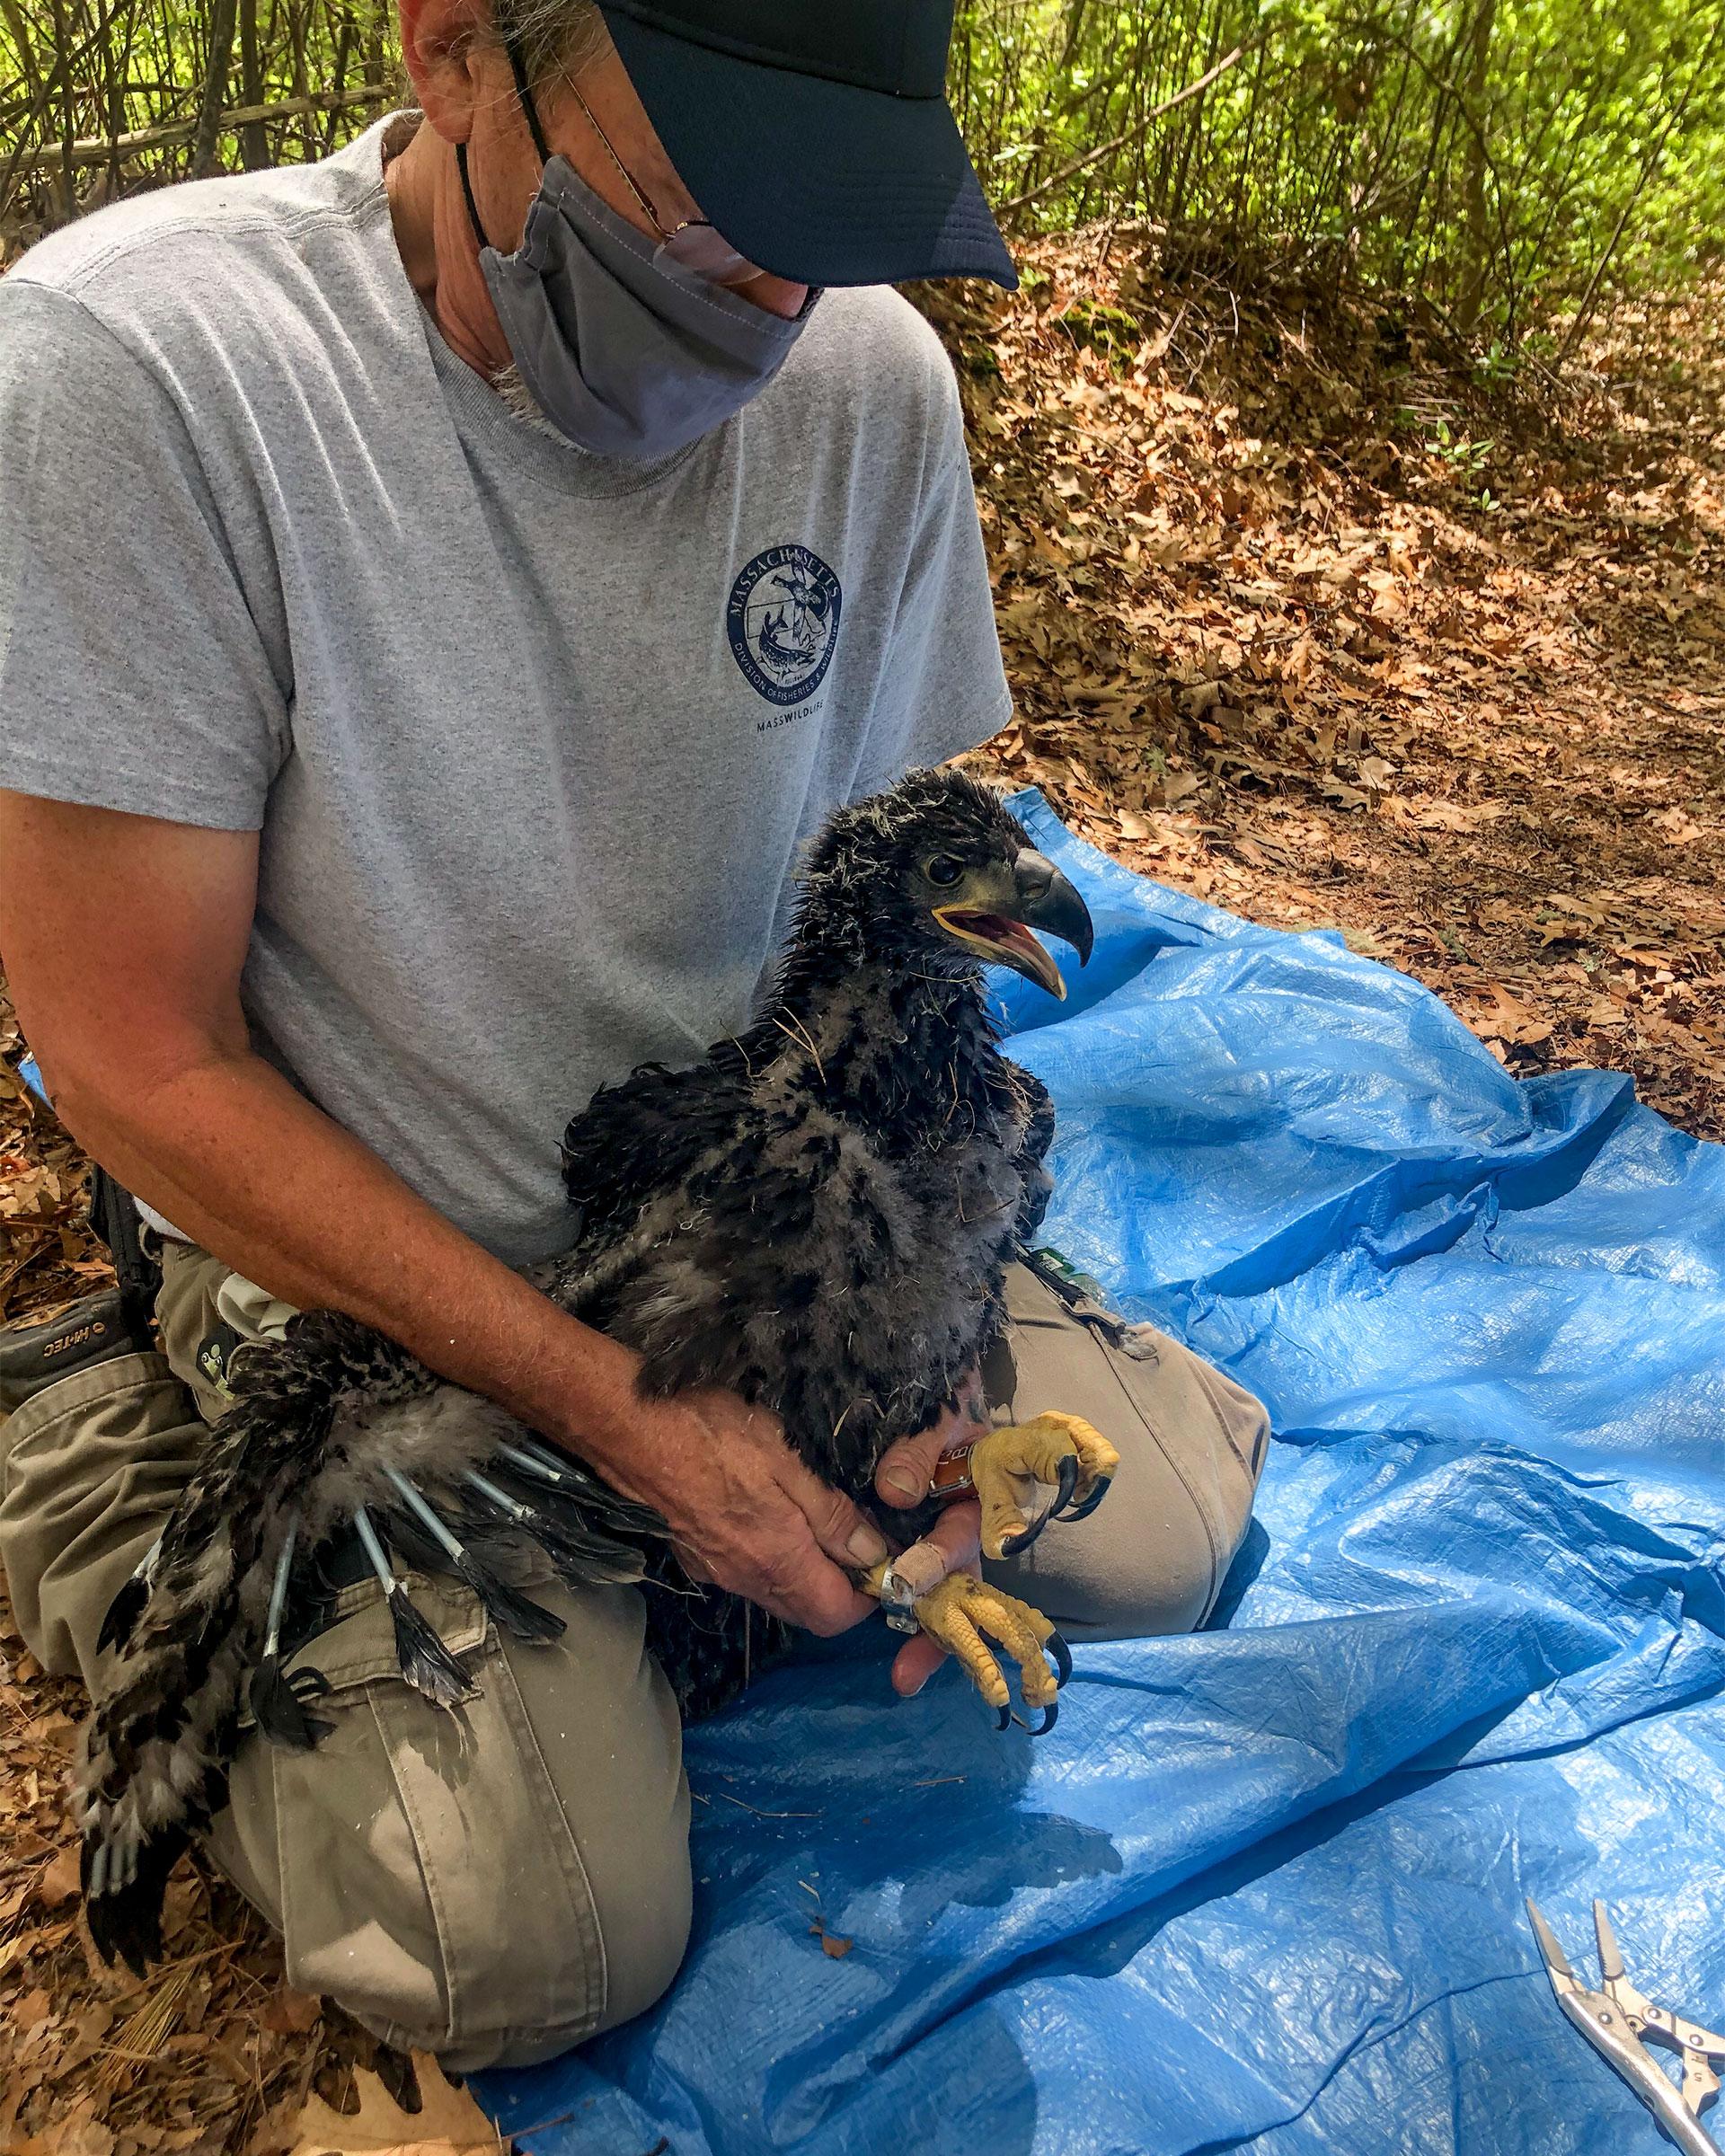 Jeff Breton of Mass Wildlife banding the eaglet. Mass Wildlife